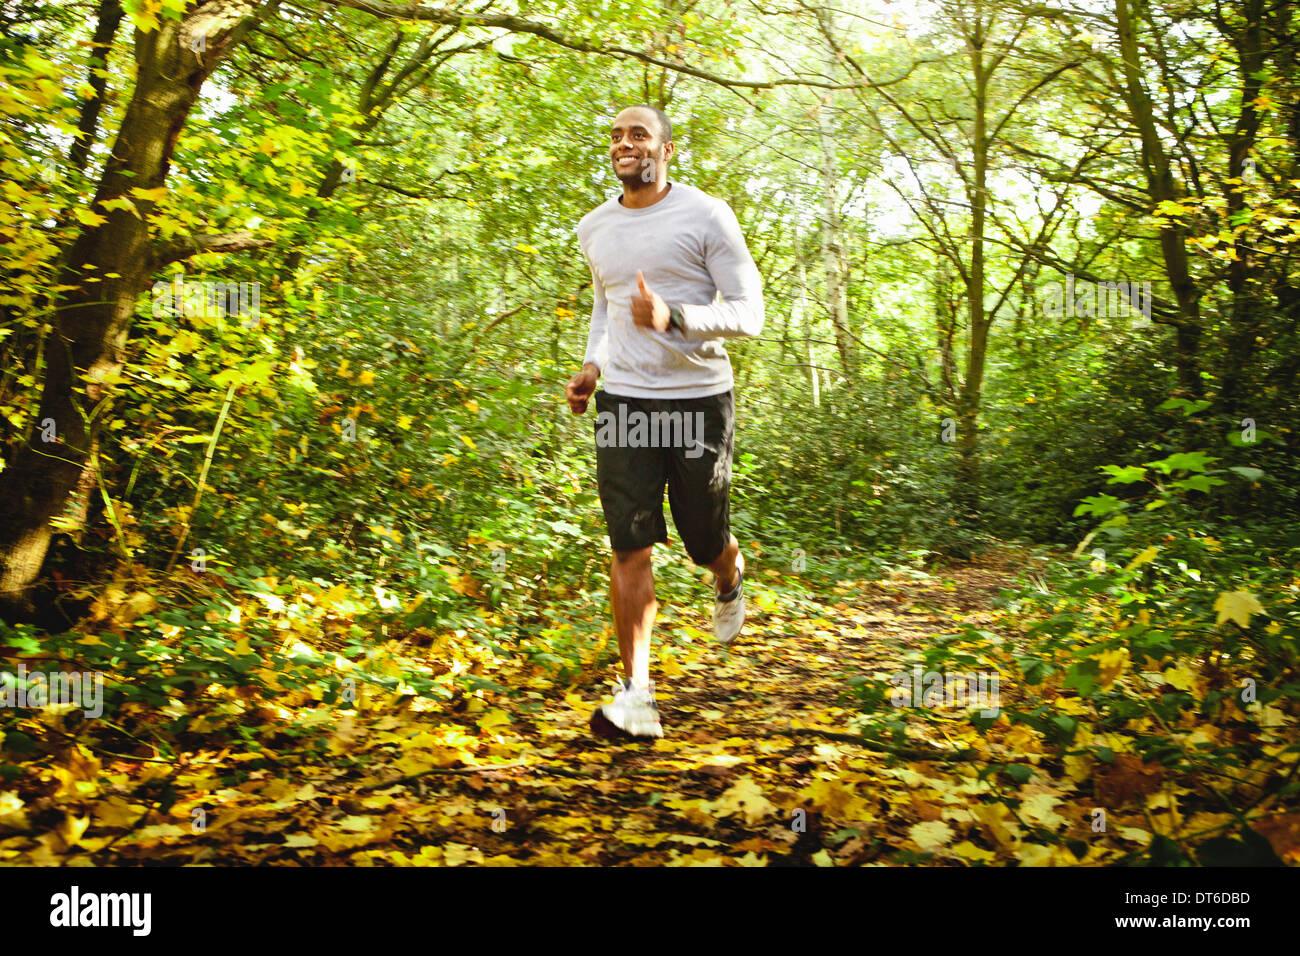 Man jogging in woods - Stock Image